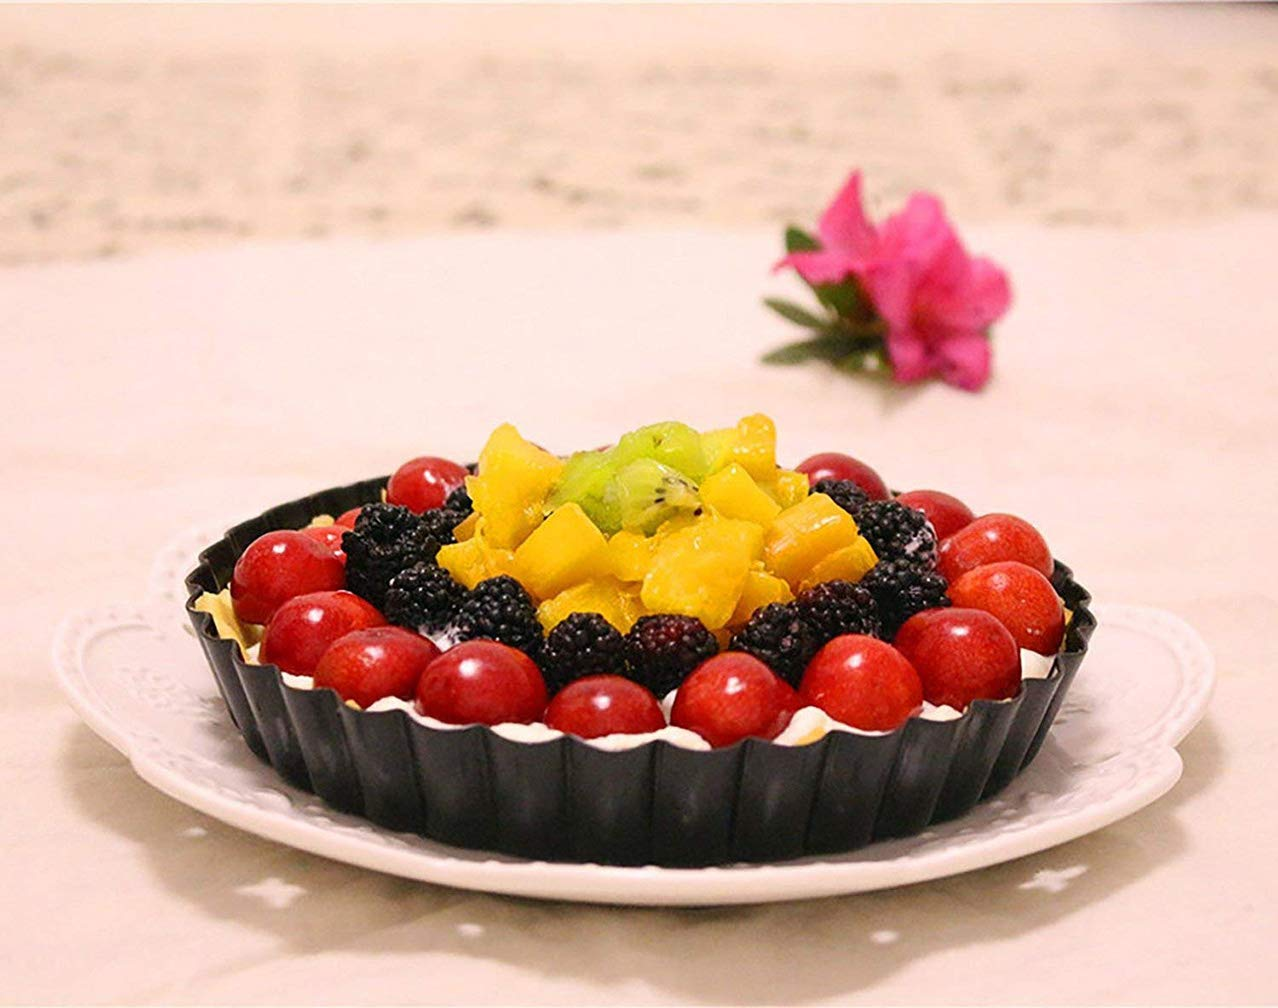 SIMINLIU Non-stick Quiche Tin//Flan Dish with Loose Base,Carbon Steel Baking Pan Pie Tray,28cm